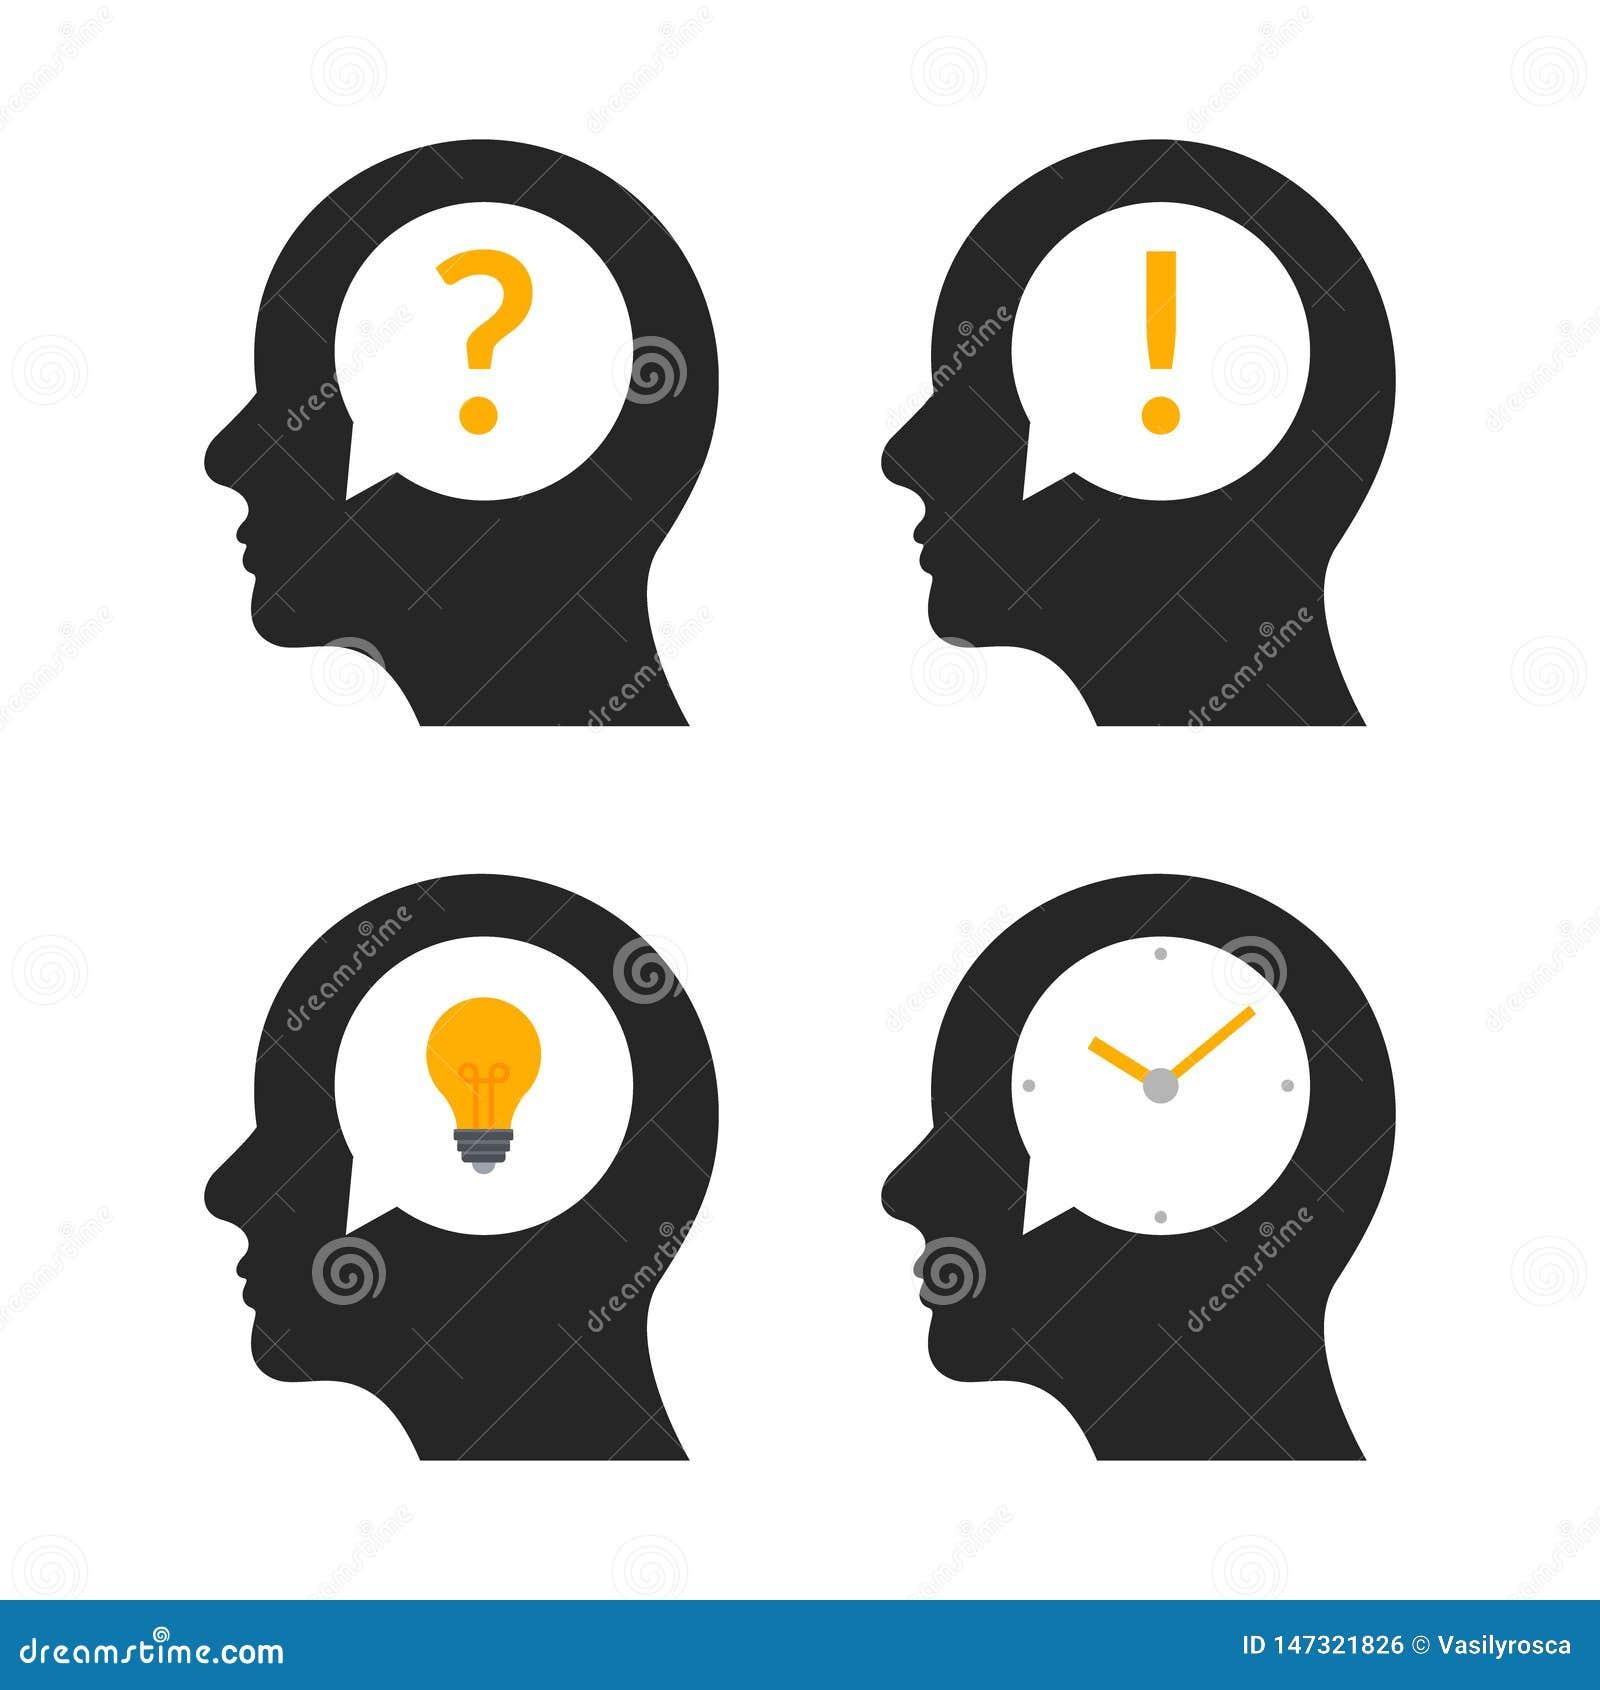 Idée De Photo De Profil profil principal humain d'idée de cerveau icône créative d